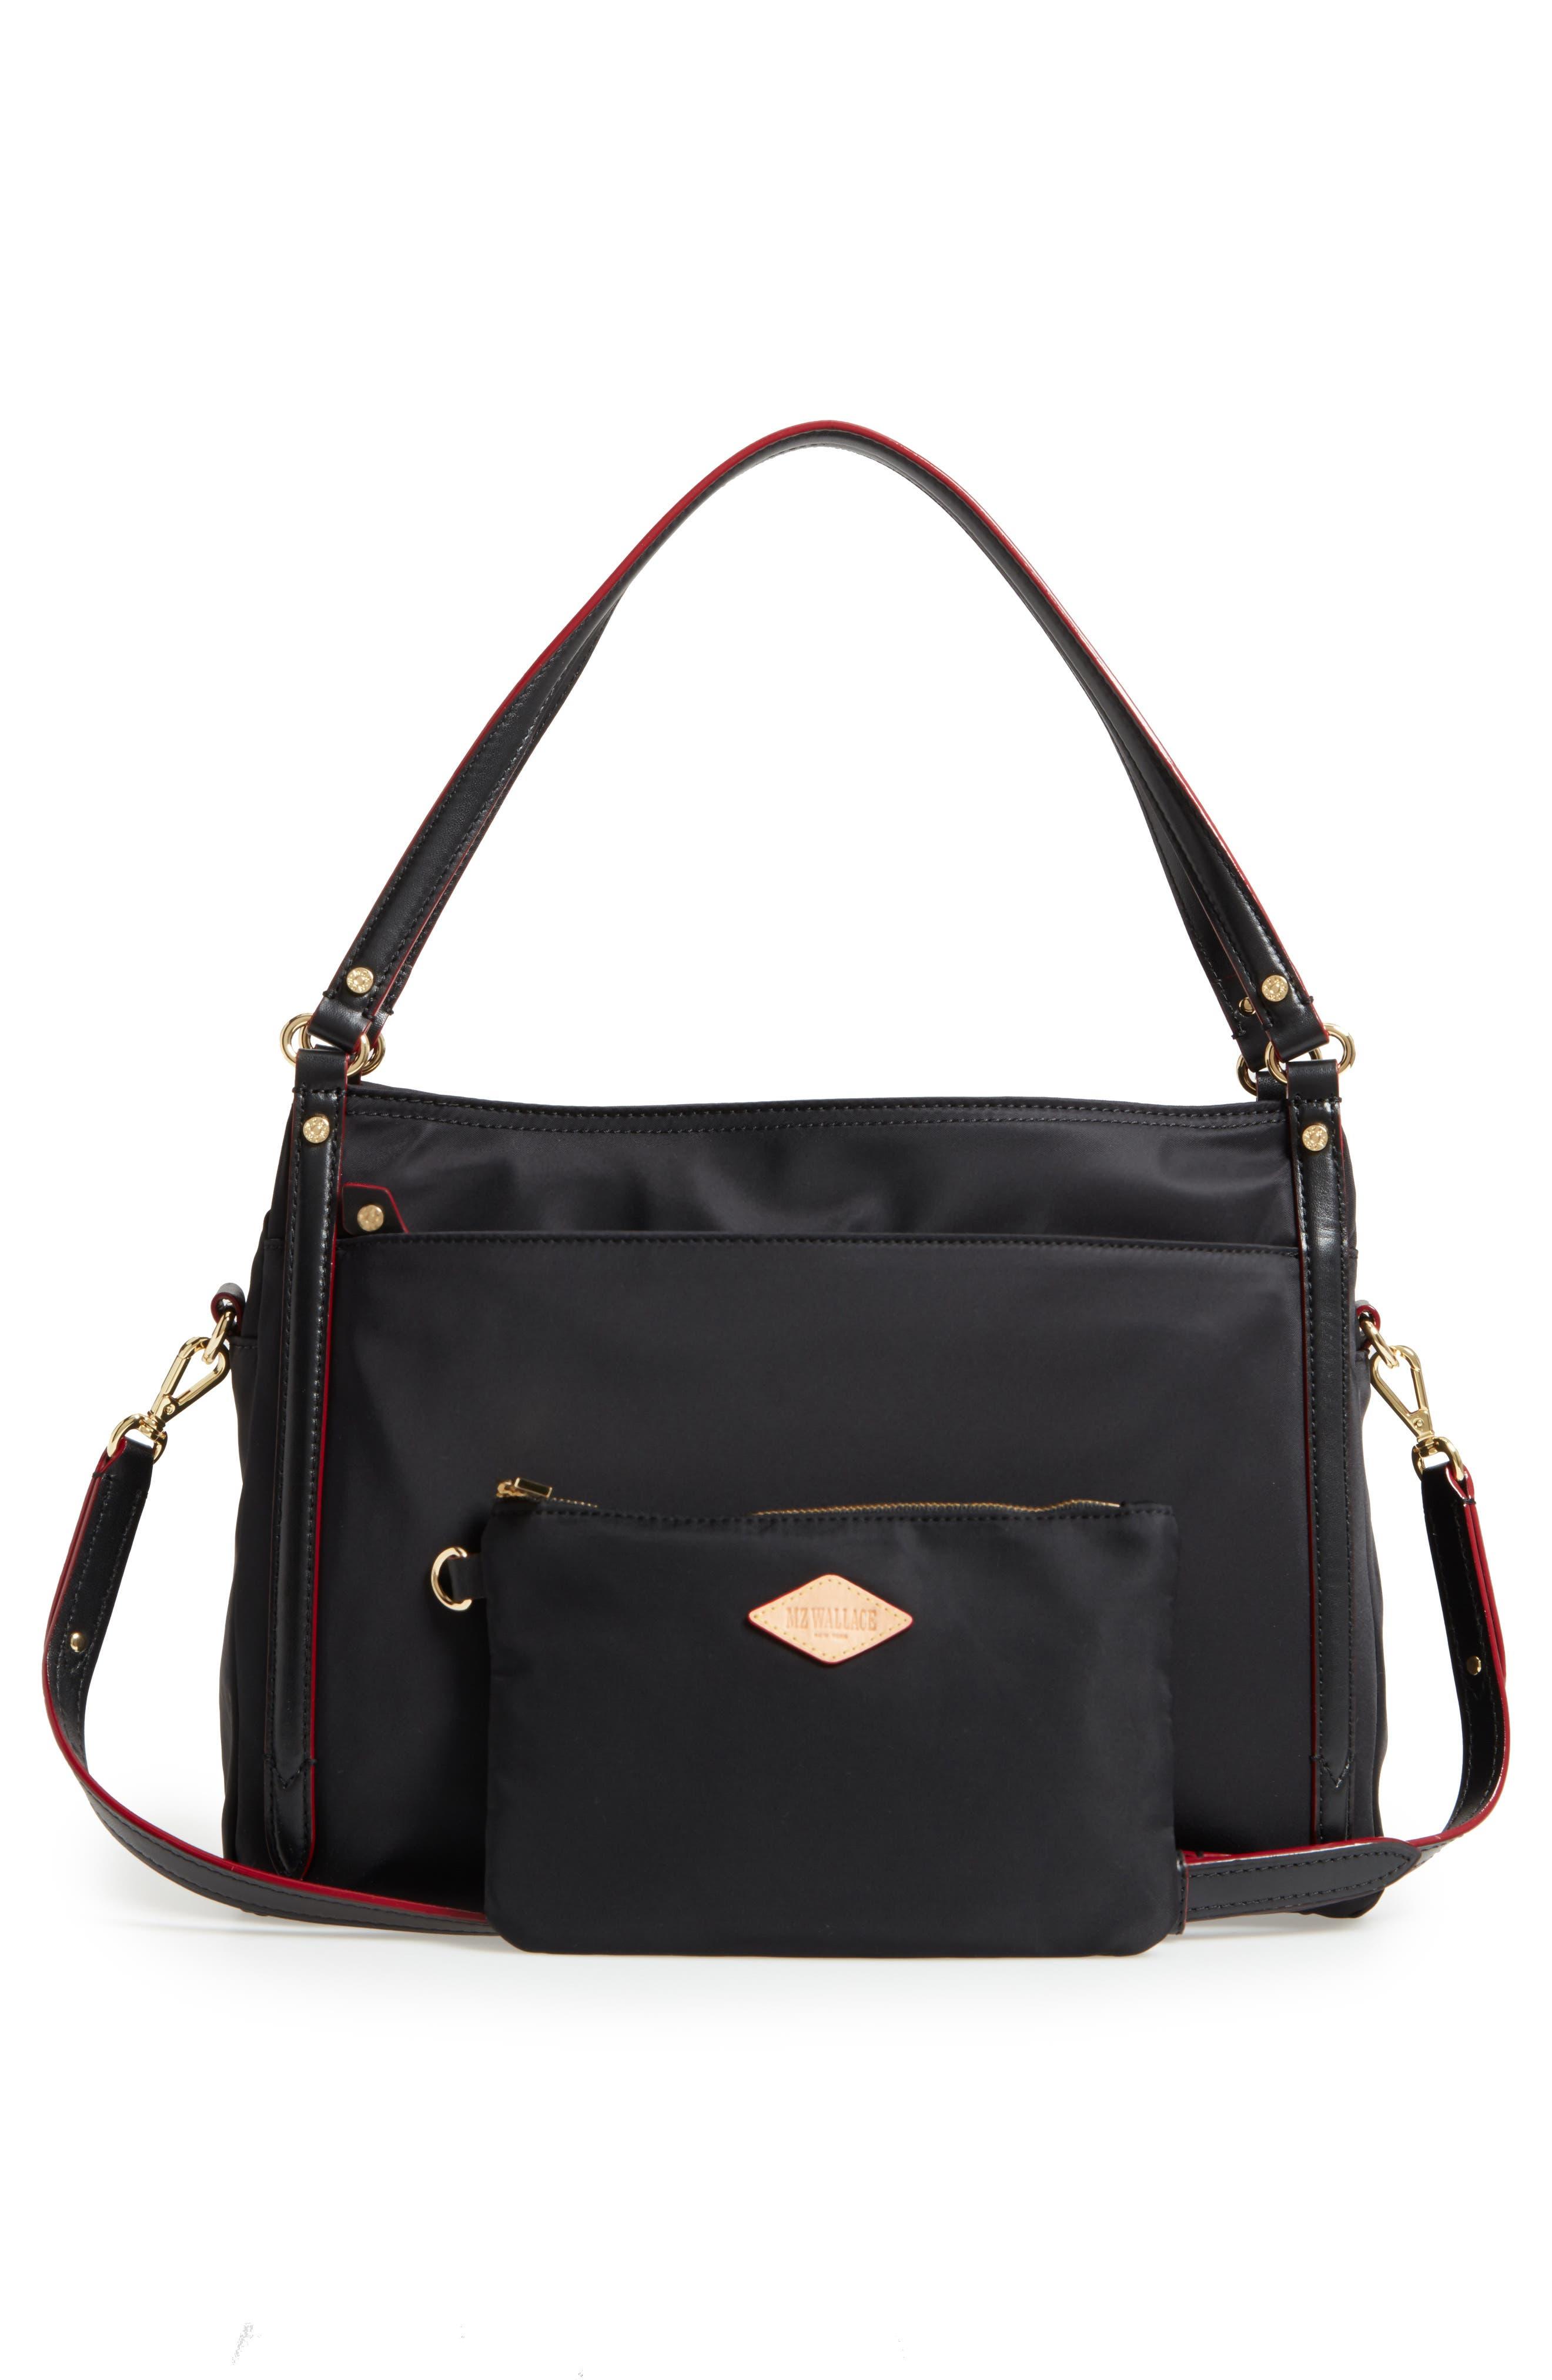 Alternate Image 1 Selected - MZ Wallace Toni Bedford Nylon Shoulder Bag